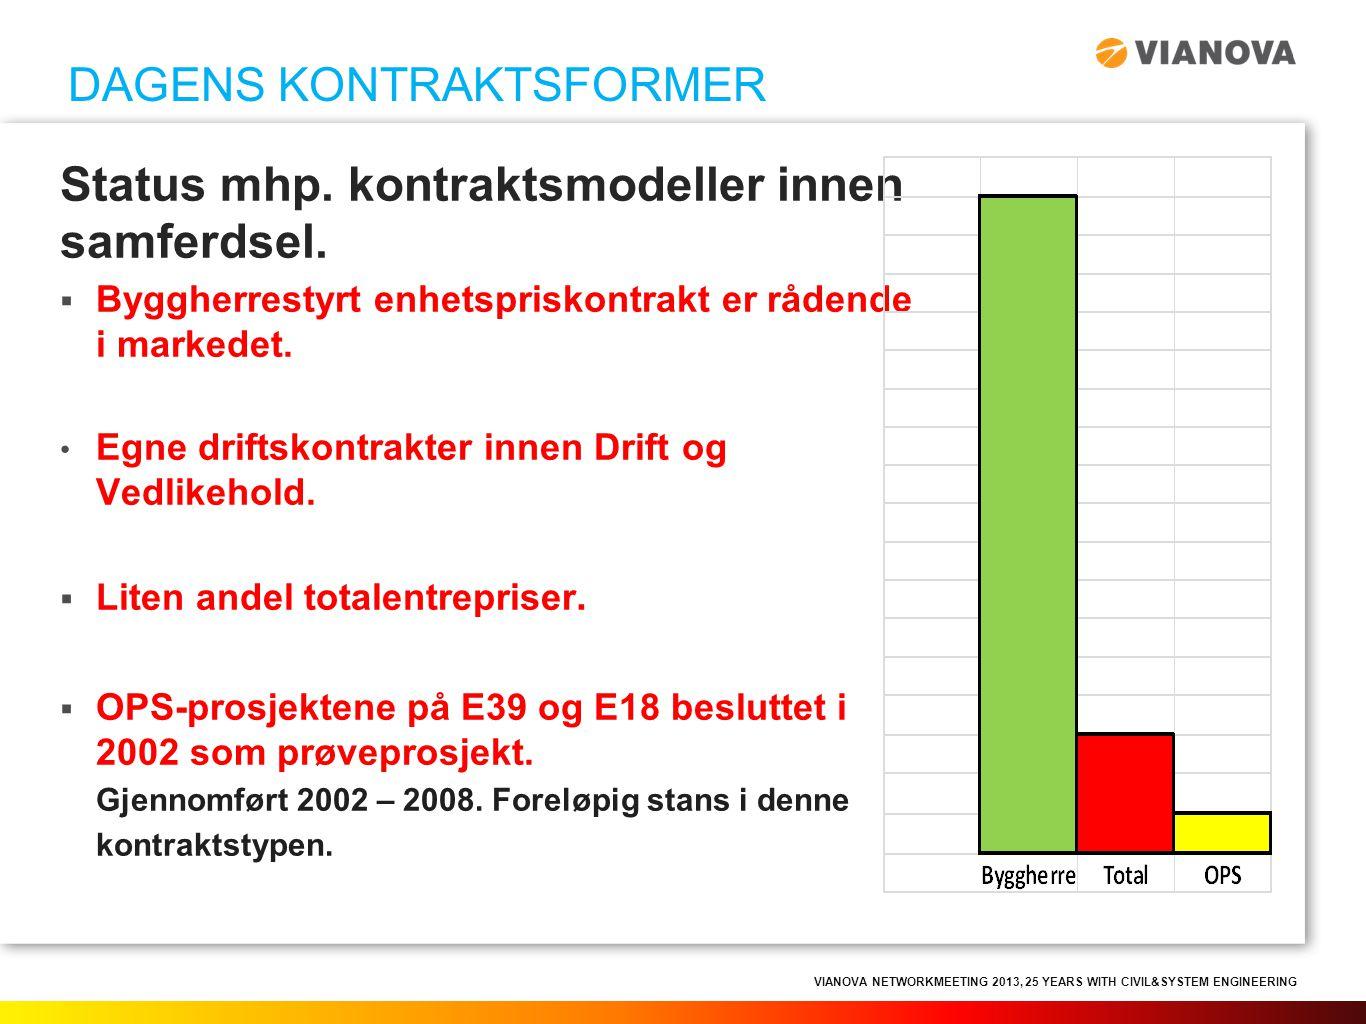 VIANOVA NETWORKMEETING 2013, 25 YEARS WITH CIVIL&SYSTEM ENGINEERING Status mhp. kontraktsmodeller innen samferdsel.  Byggherrestyrt enhetspriskontrak